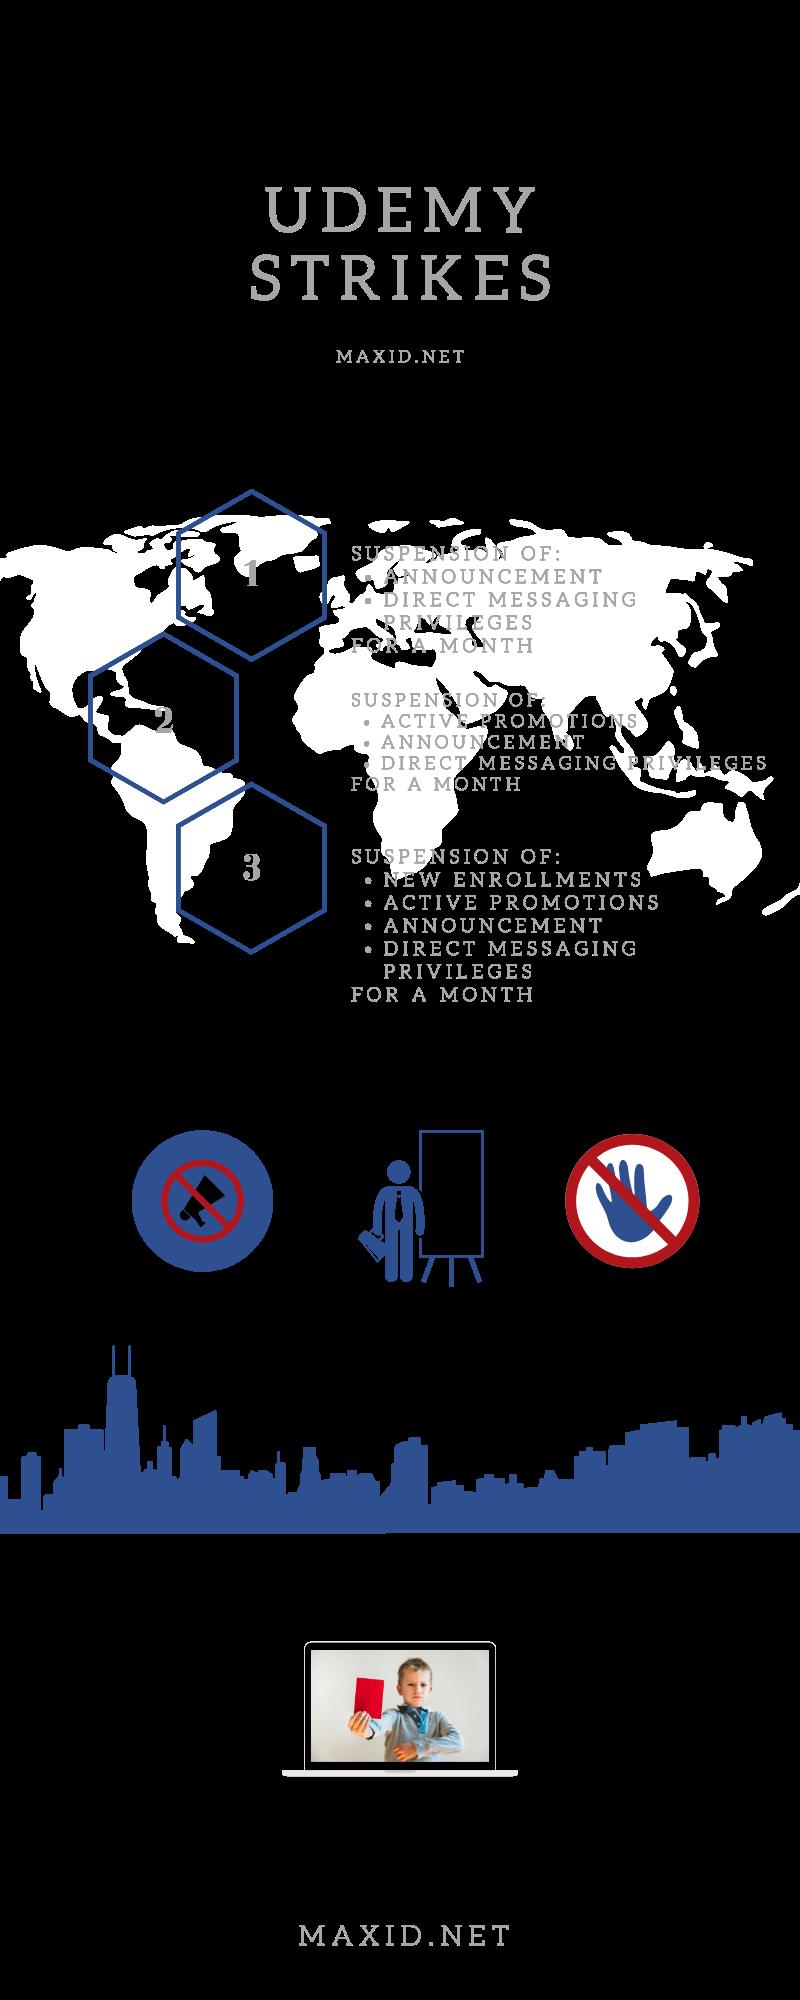 Udemy-Strikes-Infographic